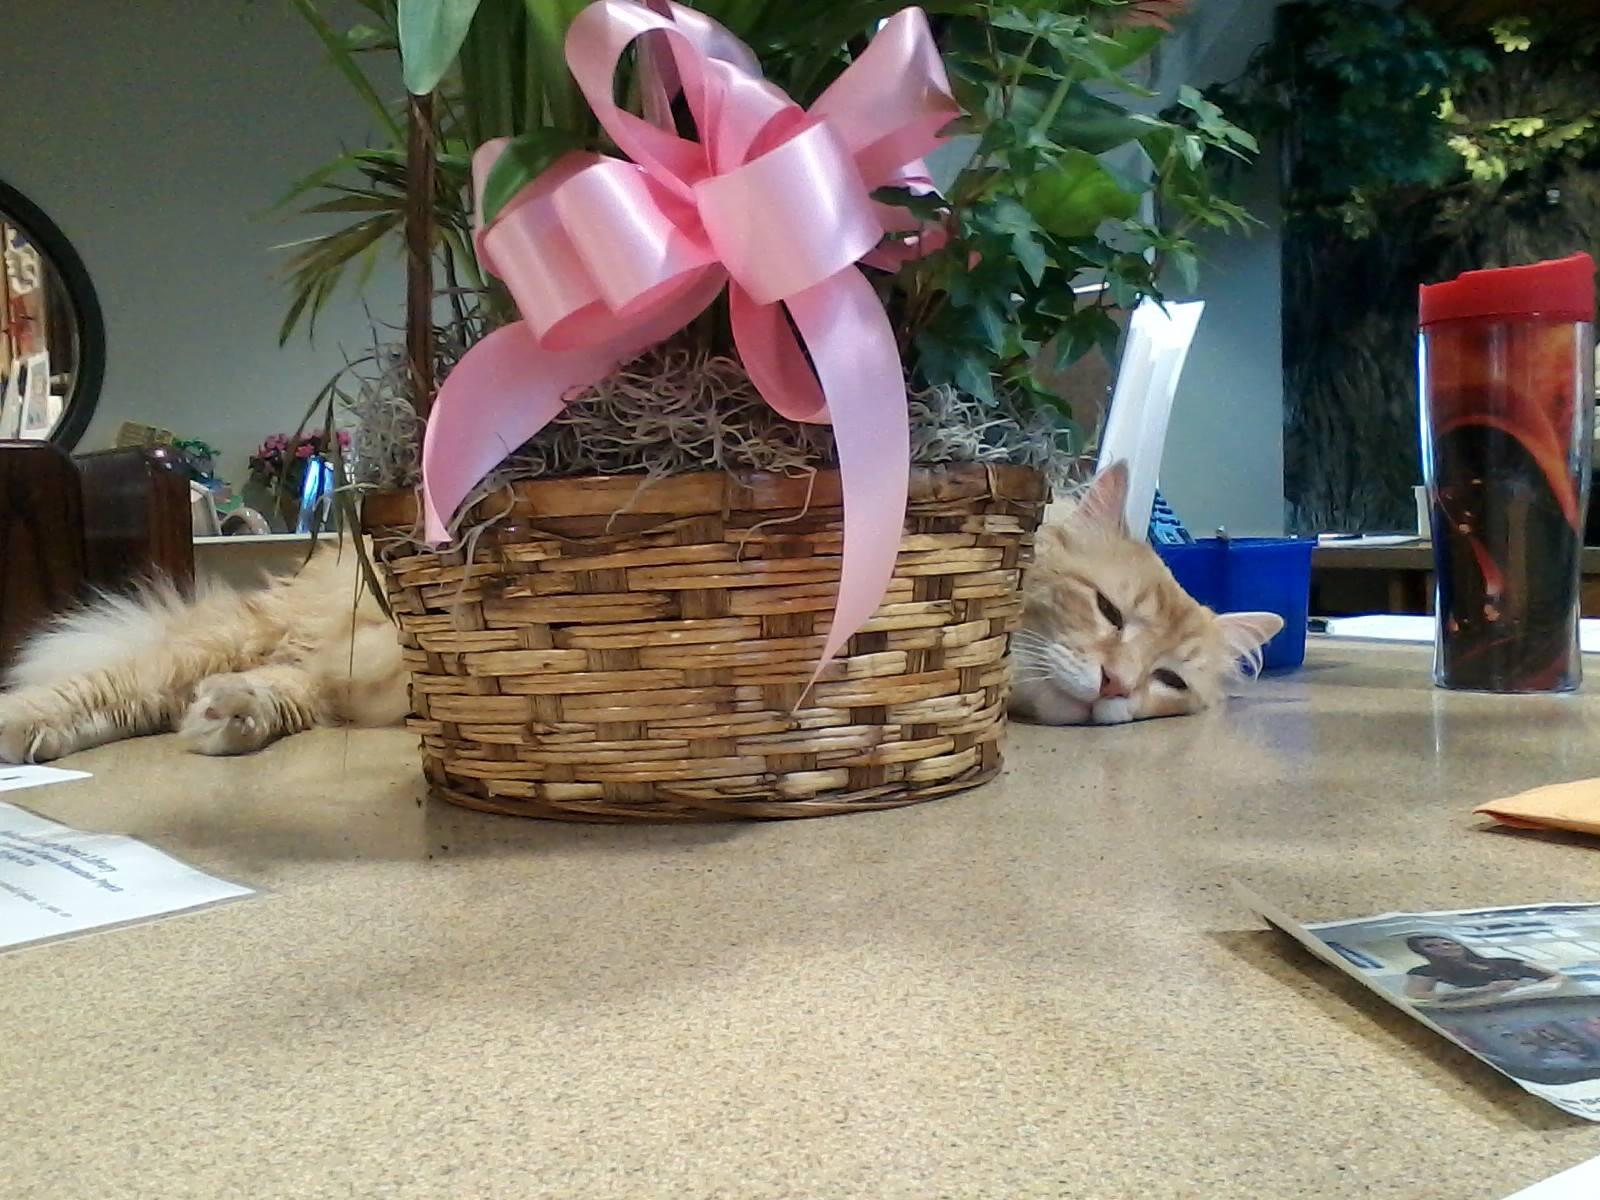 Crash Gato sleeping behind a plant